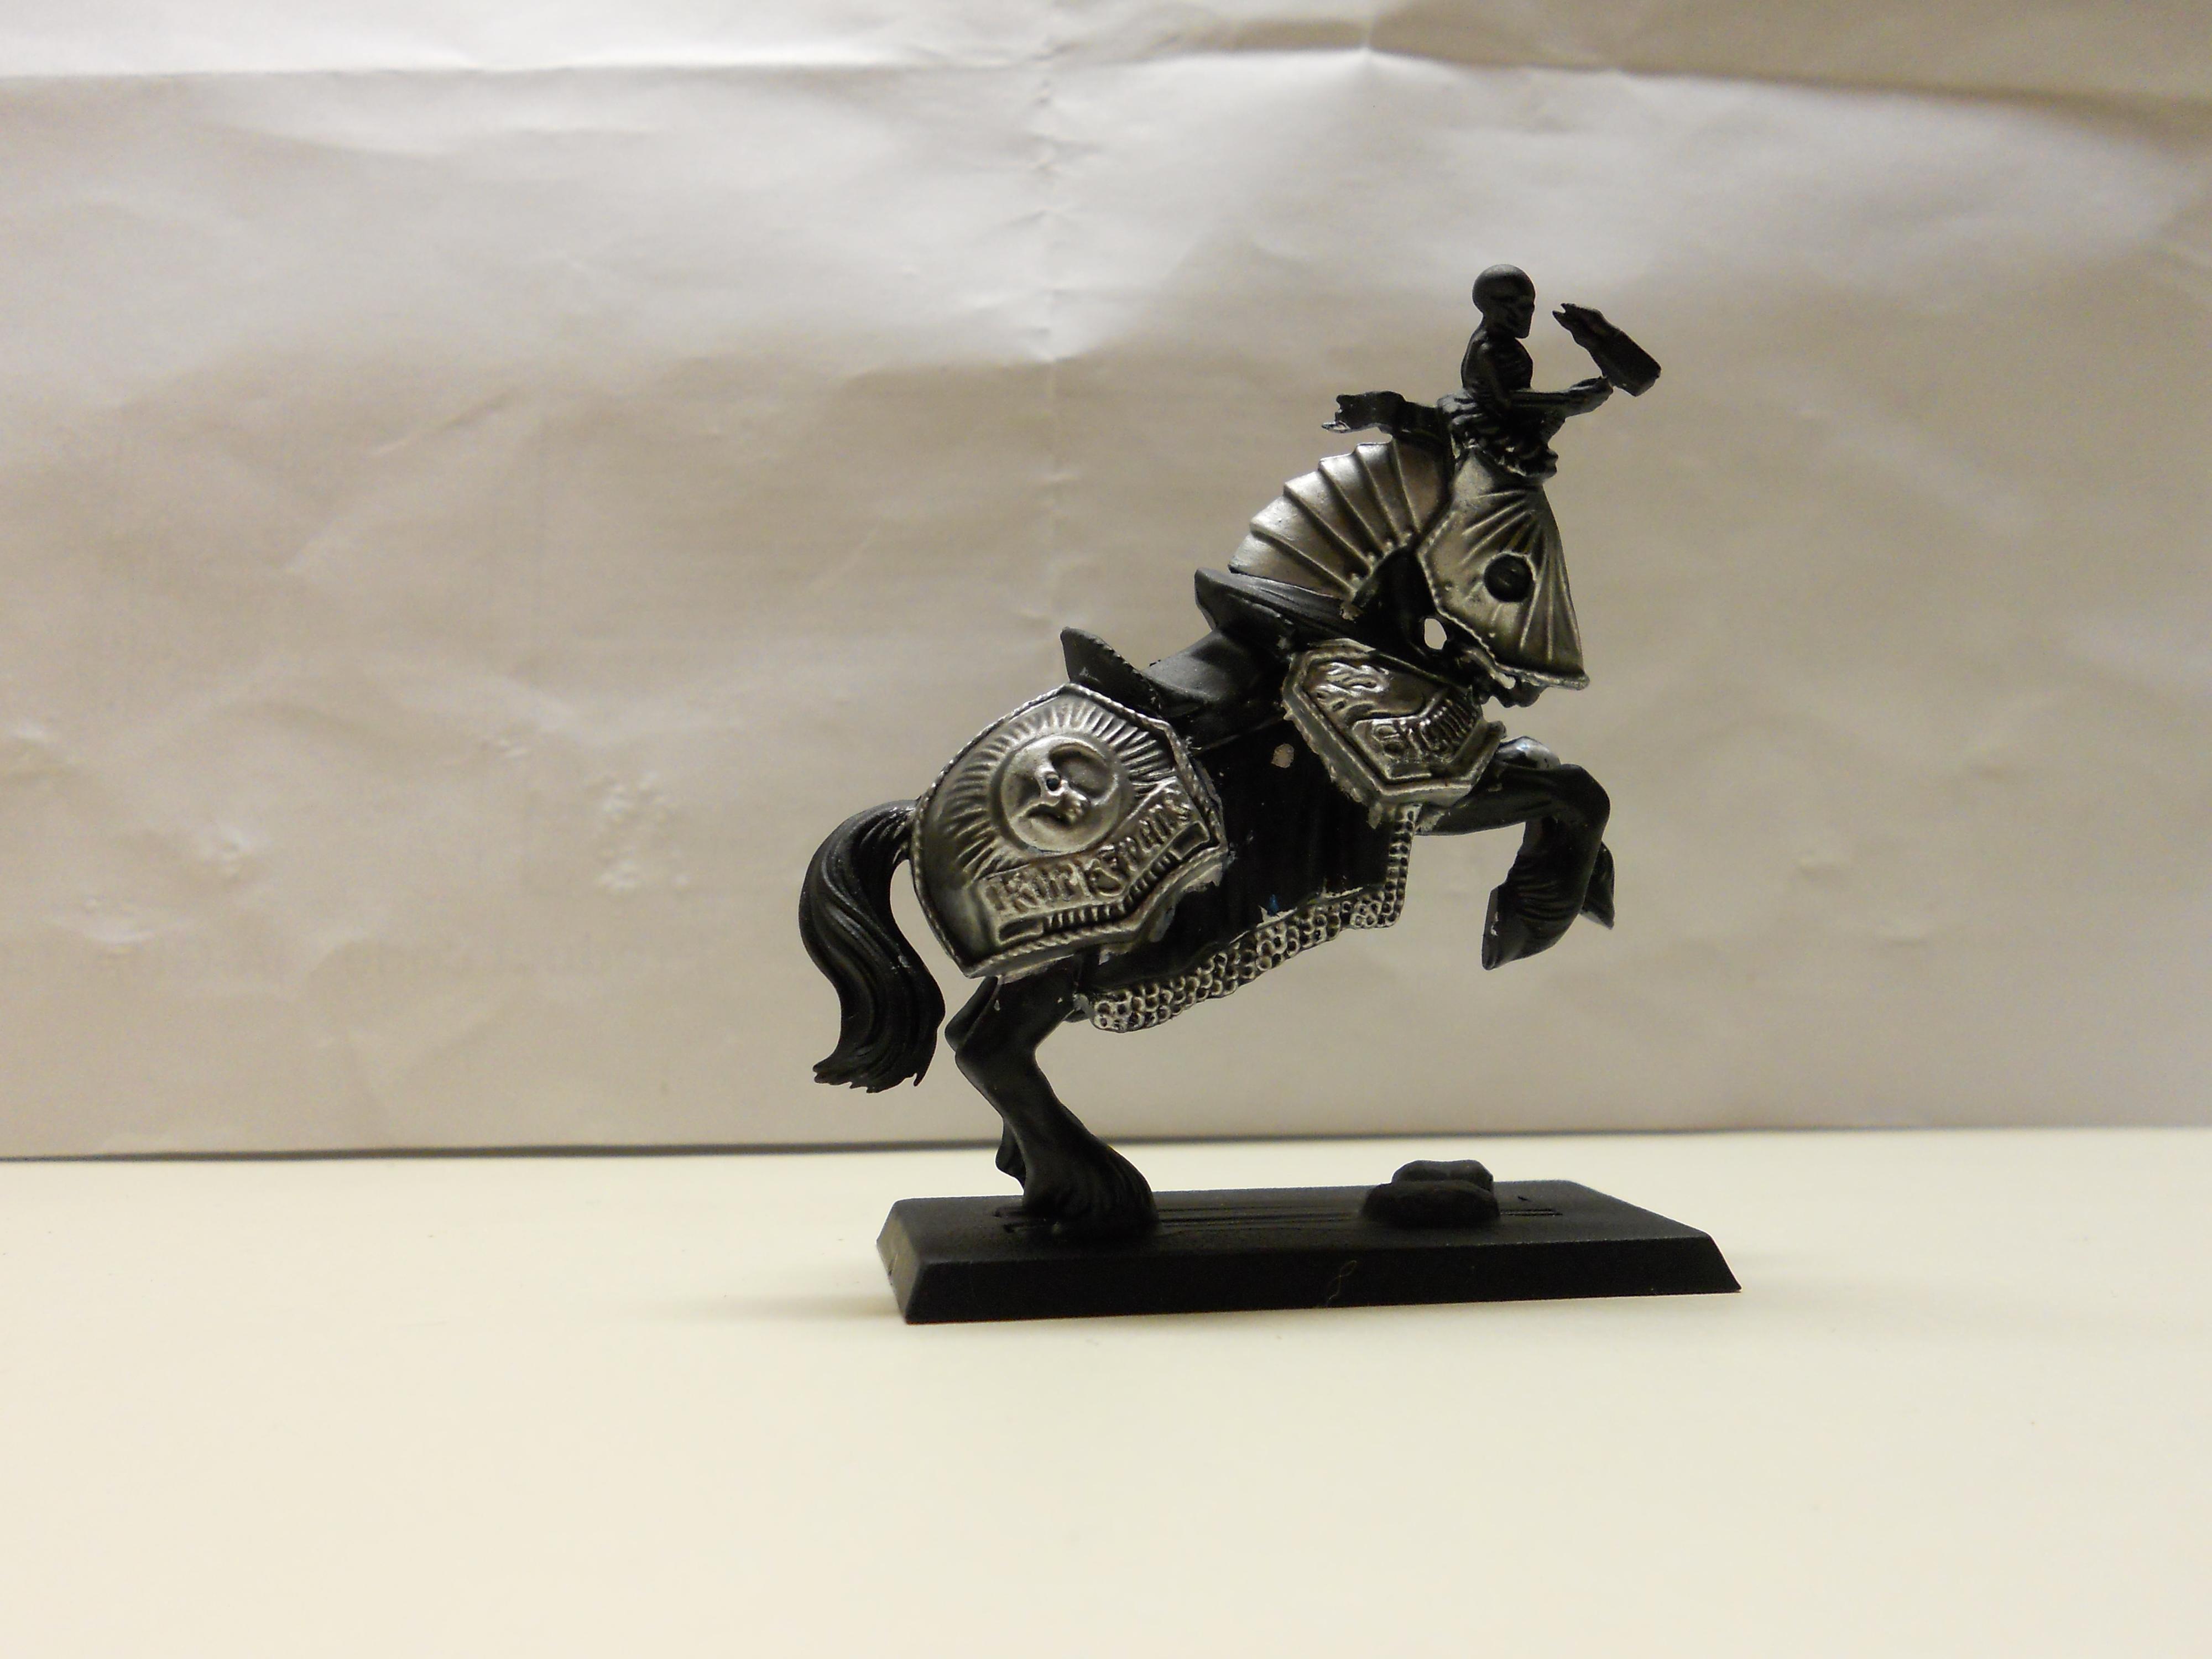 Horse armor test